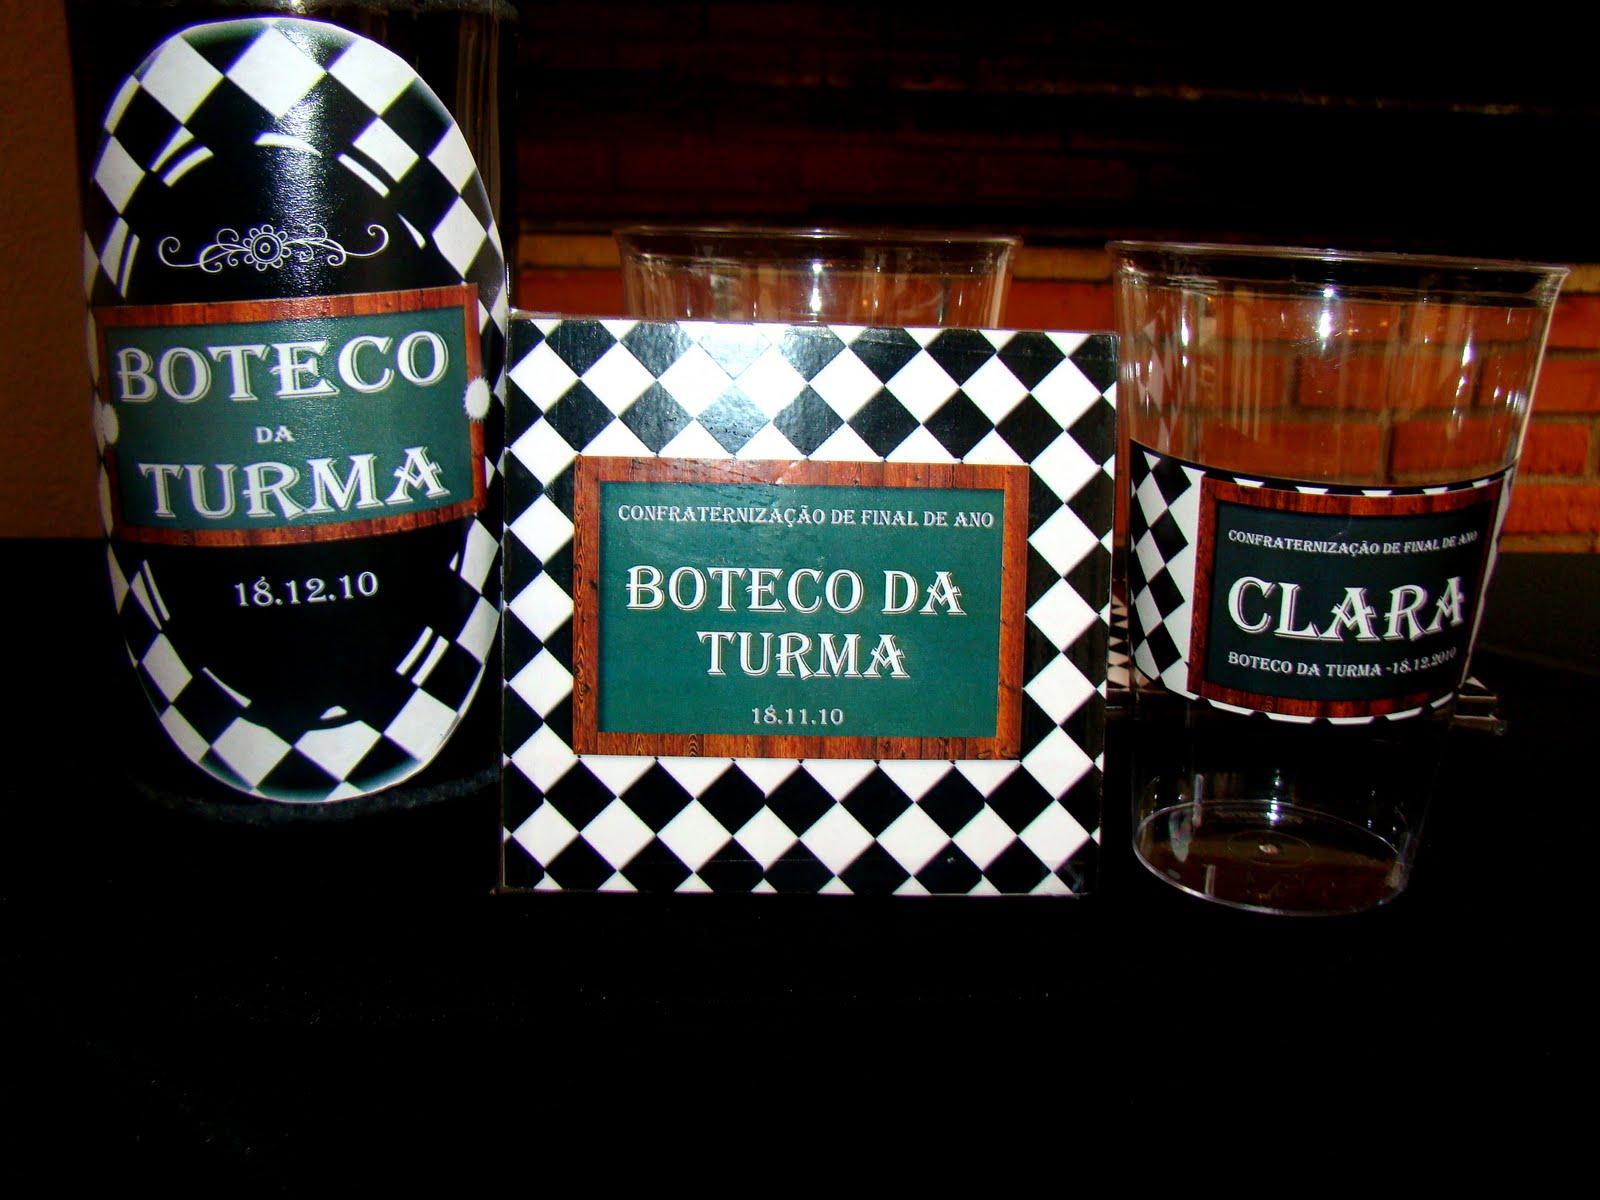 decoracao festa boteco personalizada:Olha o conjuntinho que fofo… garrafa, copo e porta-copo…. tudo